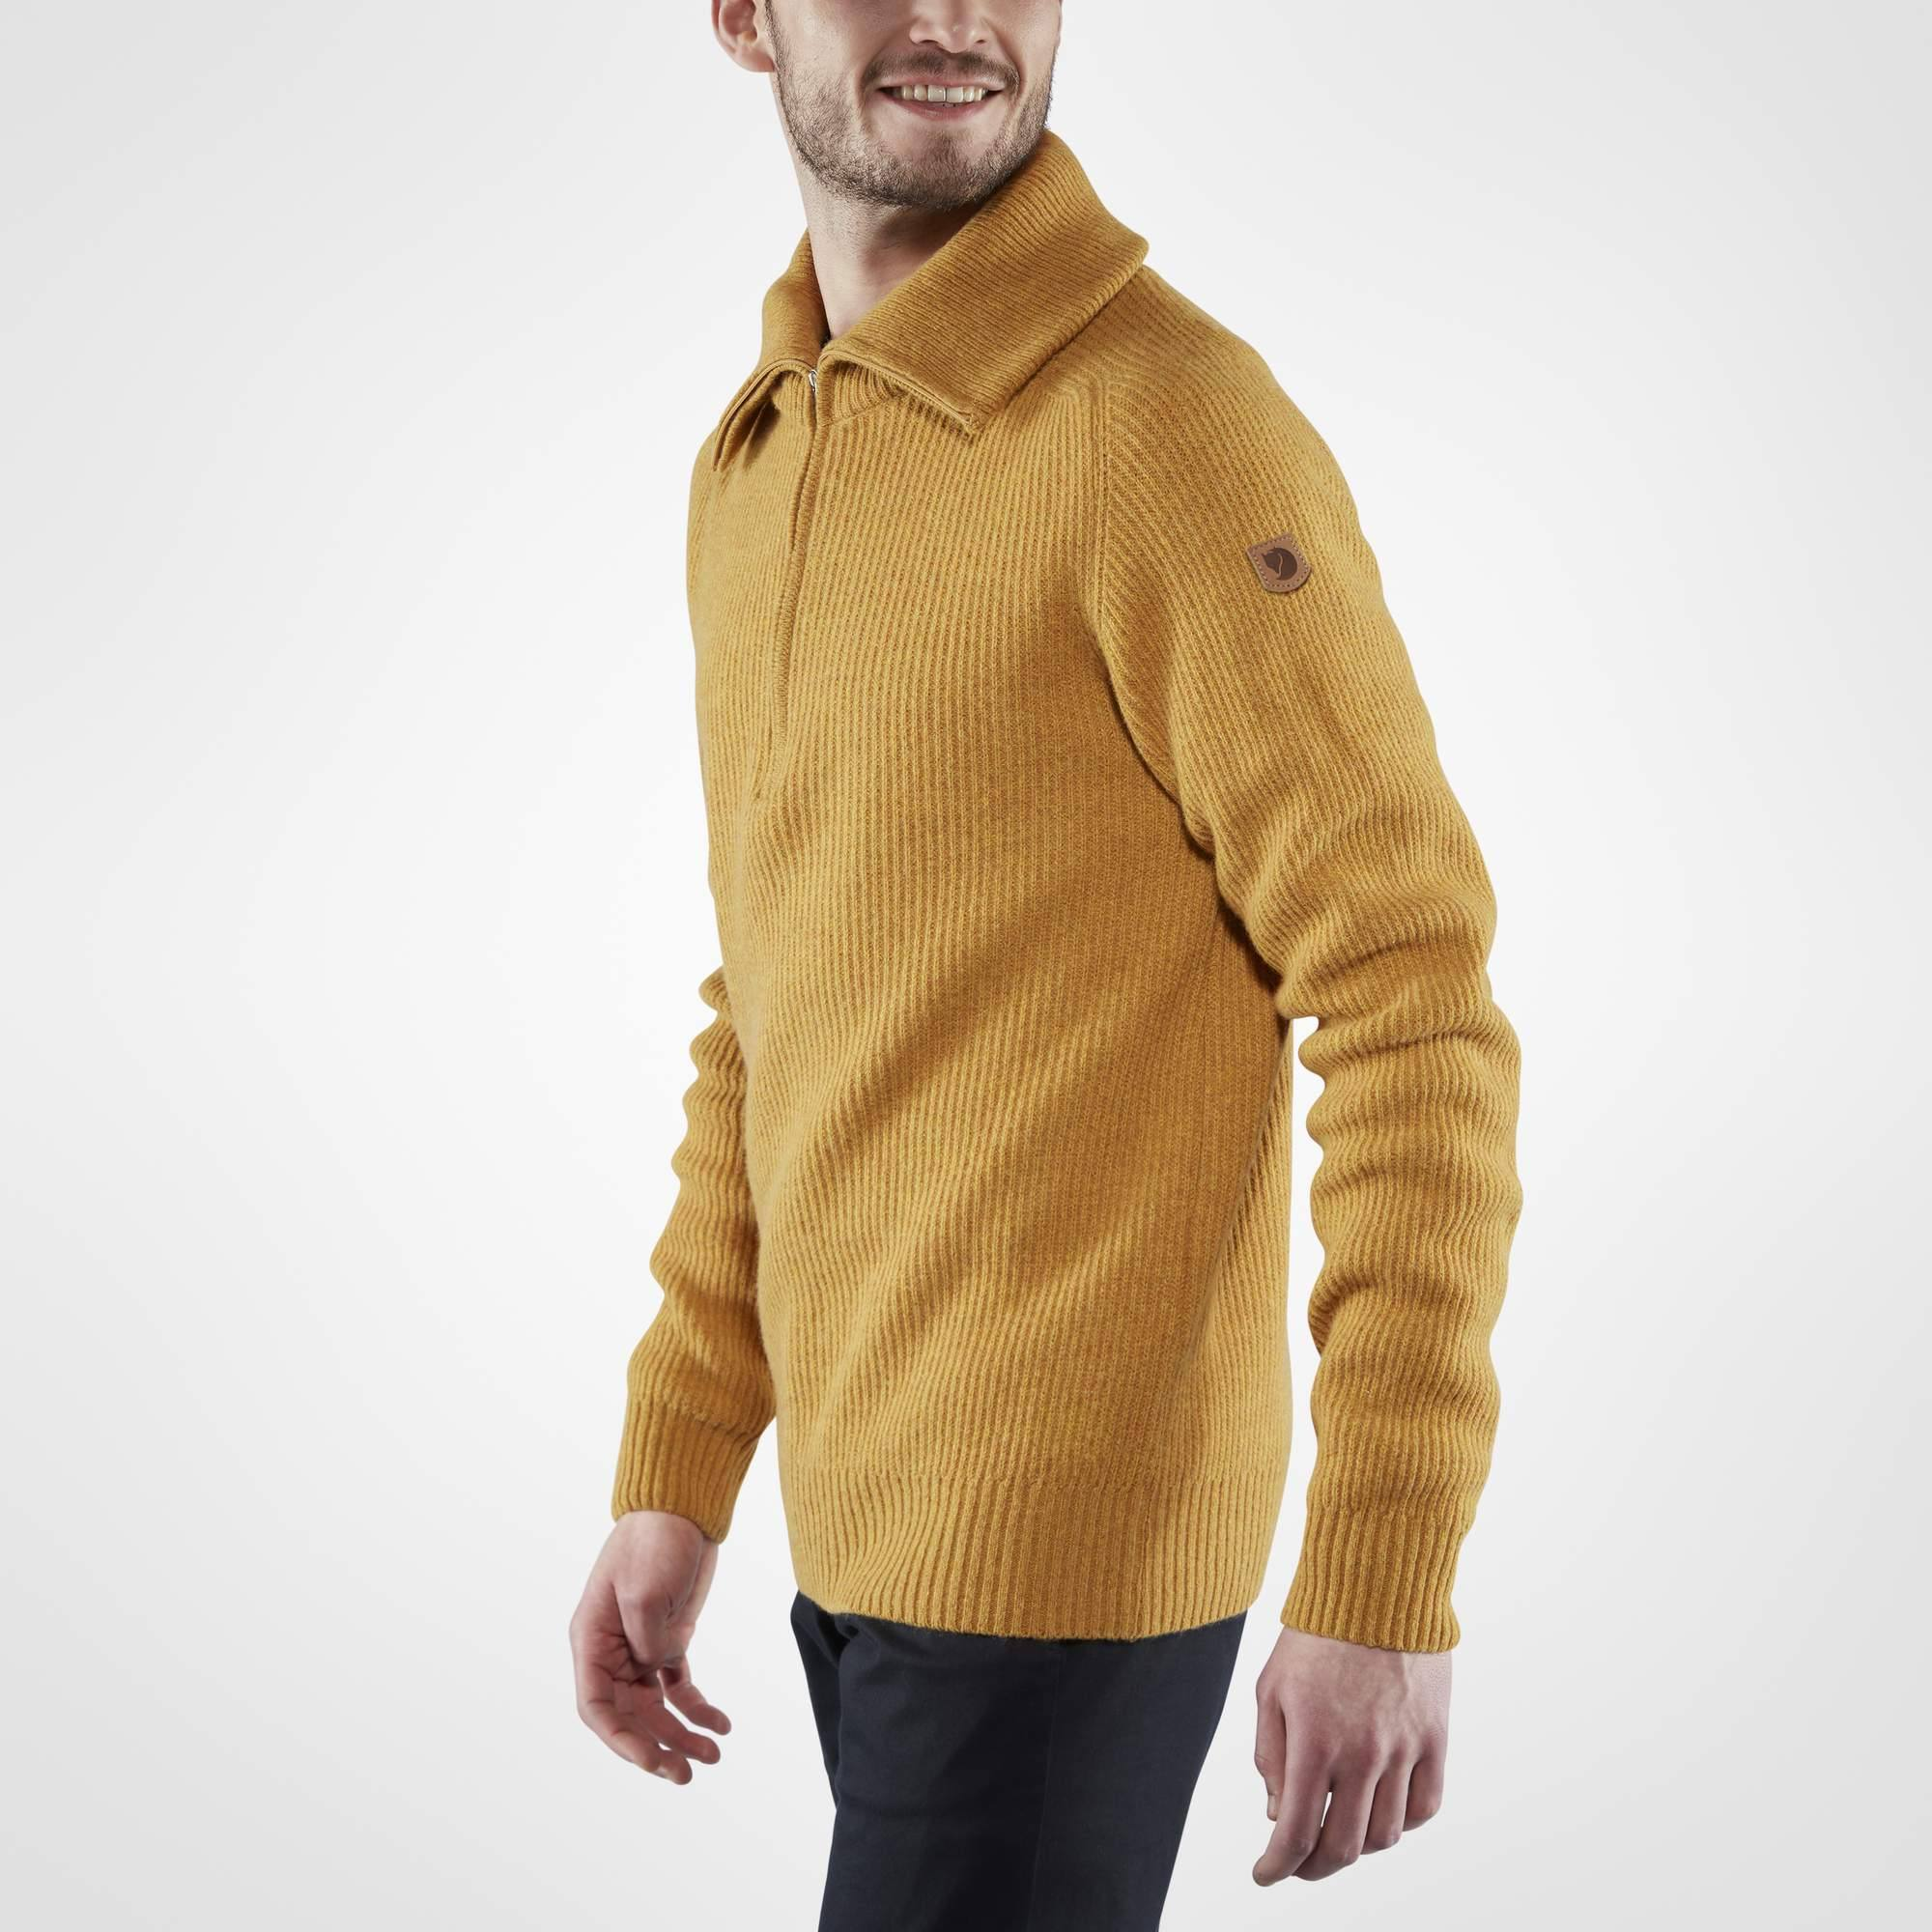 bac2806c2 Fjällräven Greenland Re-Wool Sweater | Scandinavian Outdoor